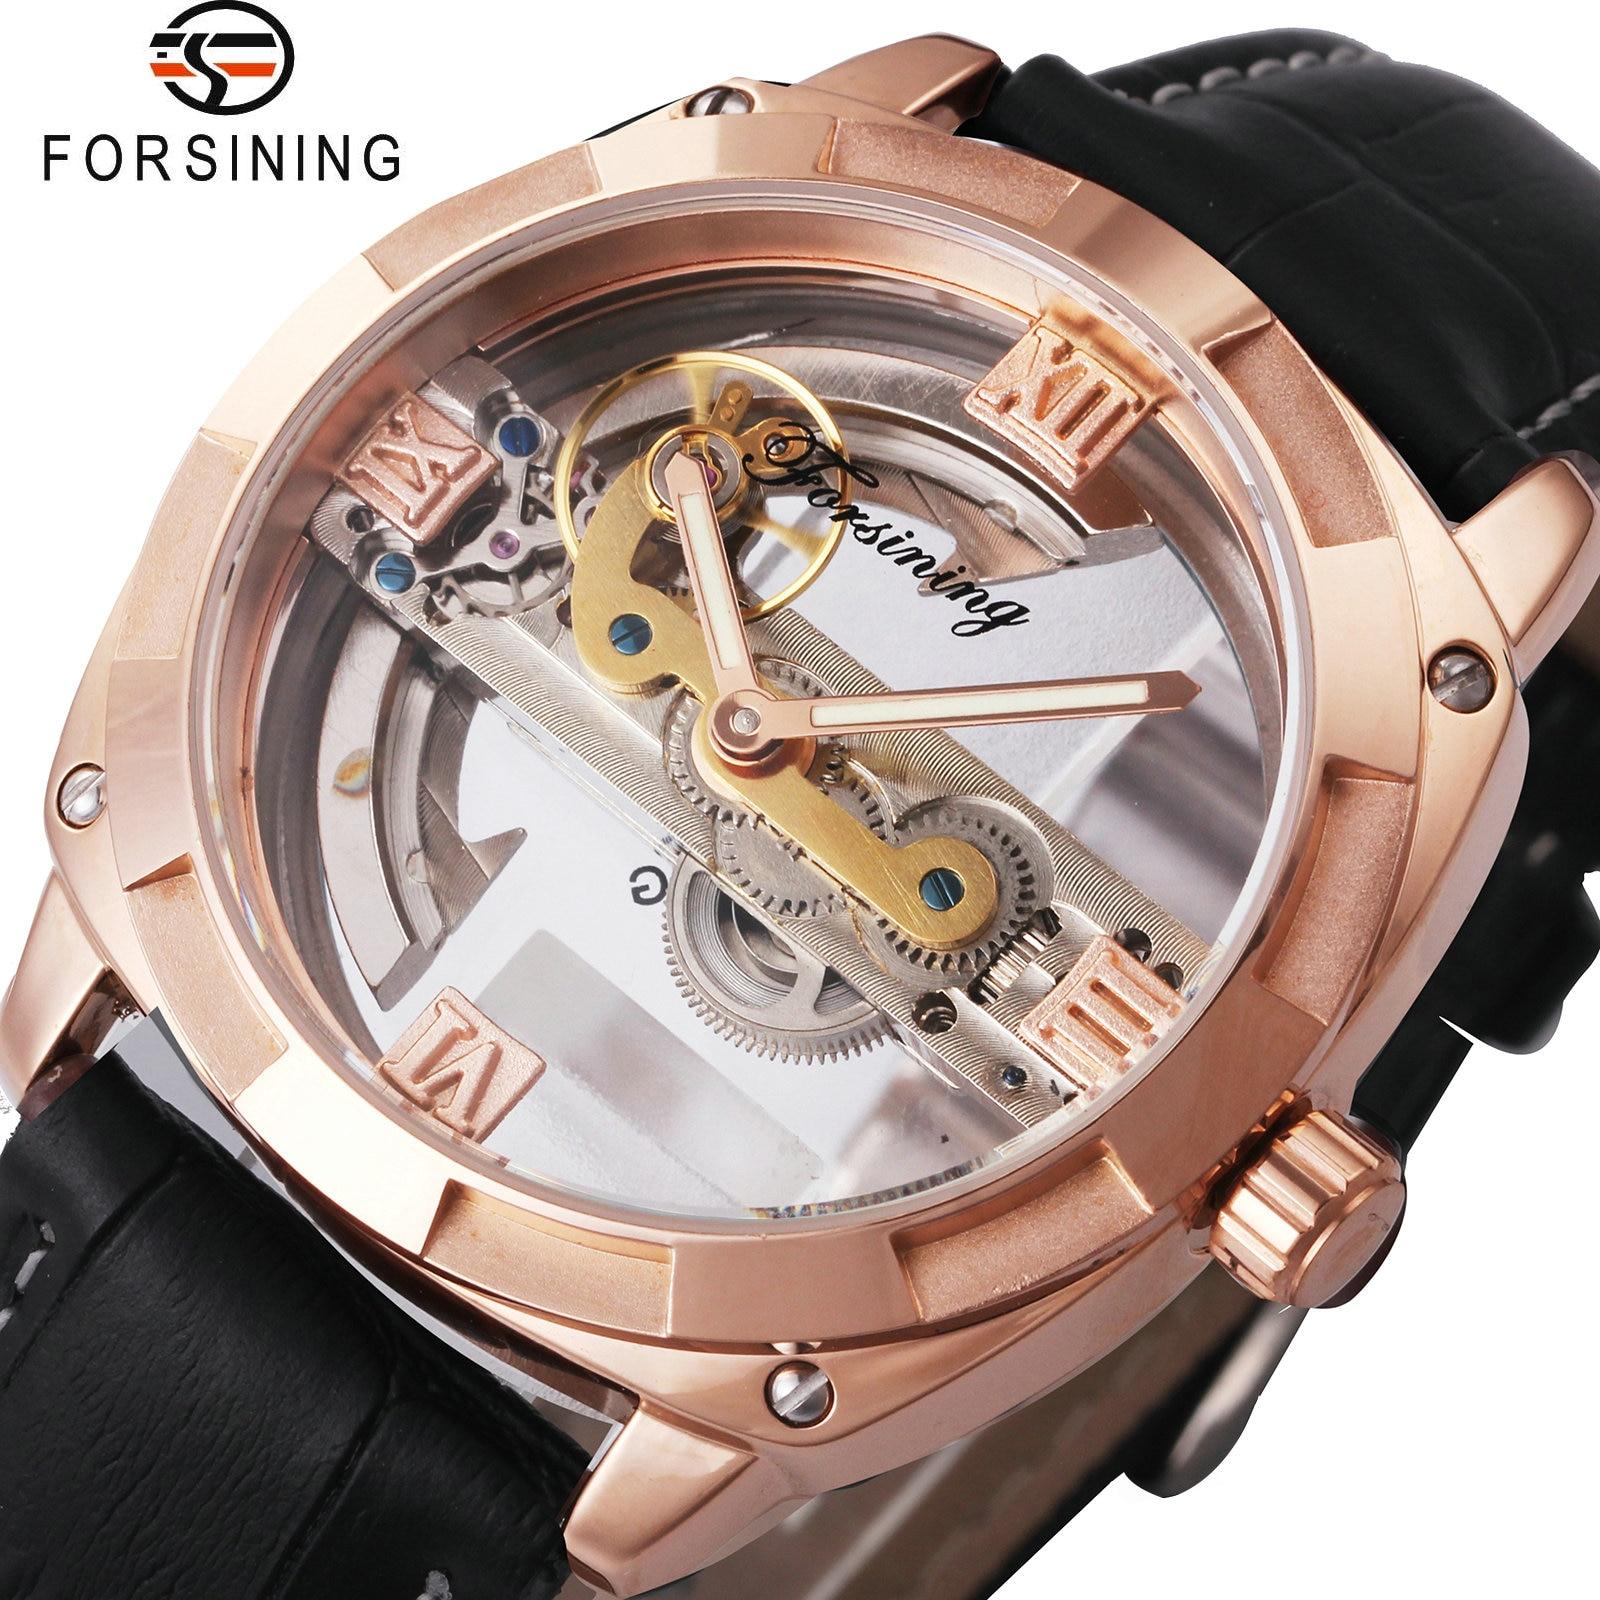 FORSINING Rose Golden Mechanical Watches Men Golden Bridge Design Transparent Luminous Hands Dial Top Brand Wrist Watches 2018 маска tony moly natural aroma oil mask tea tree